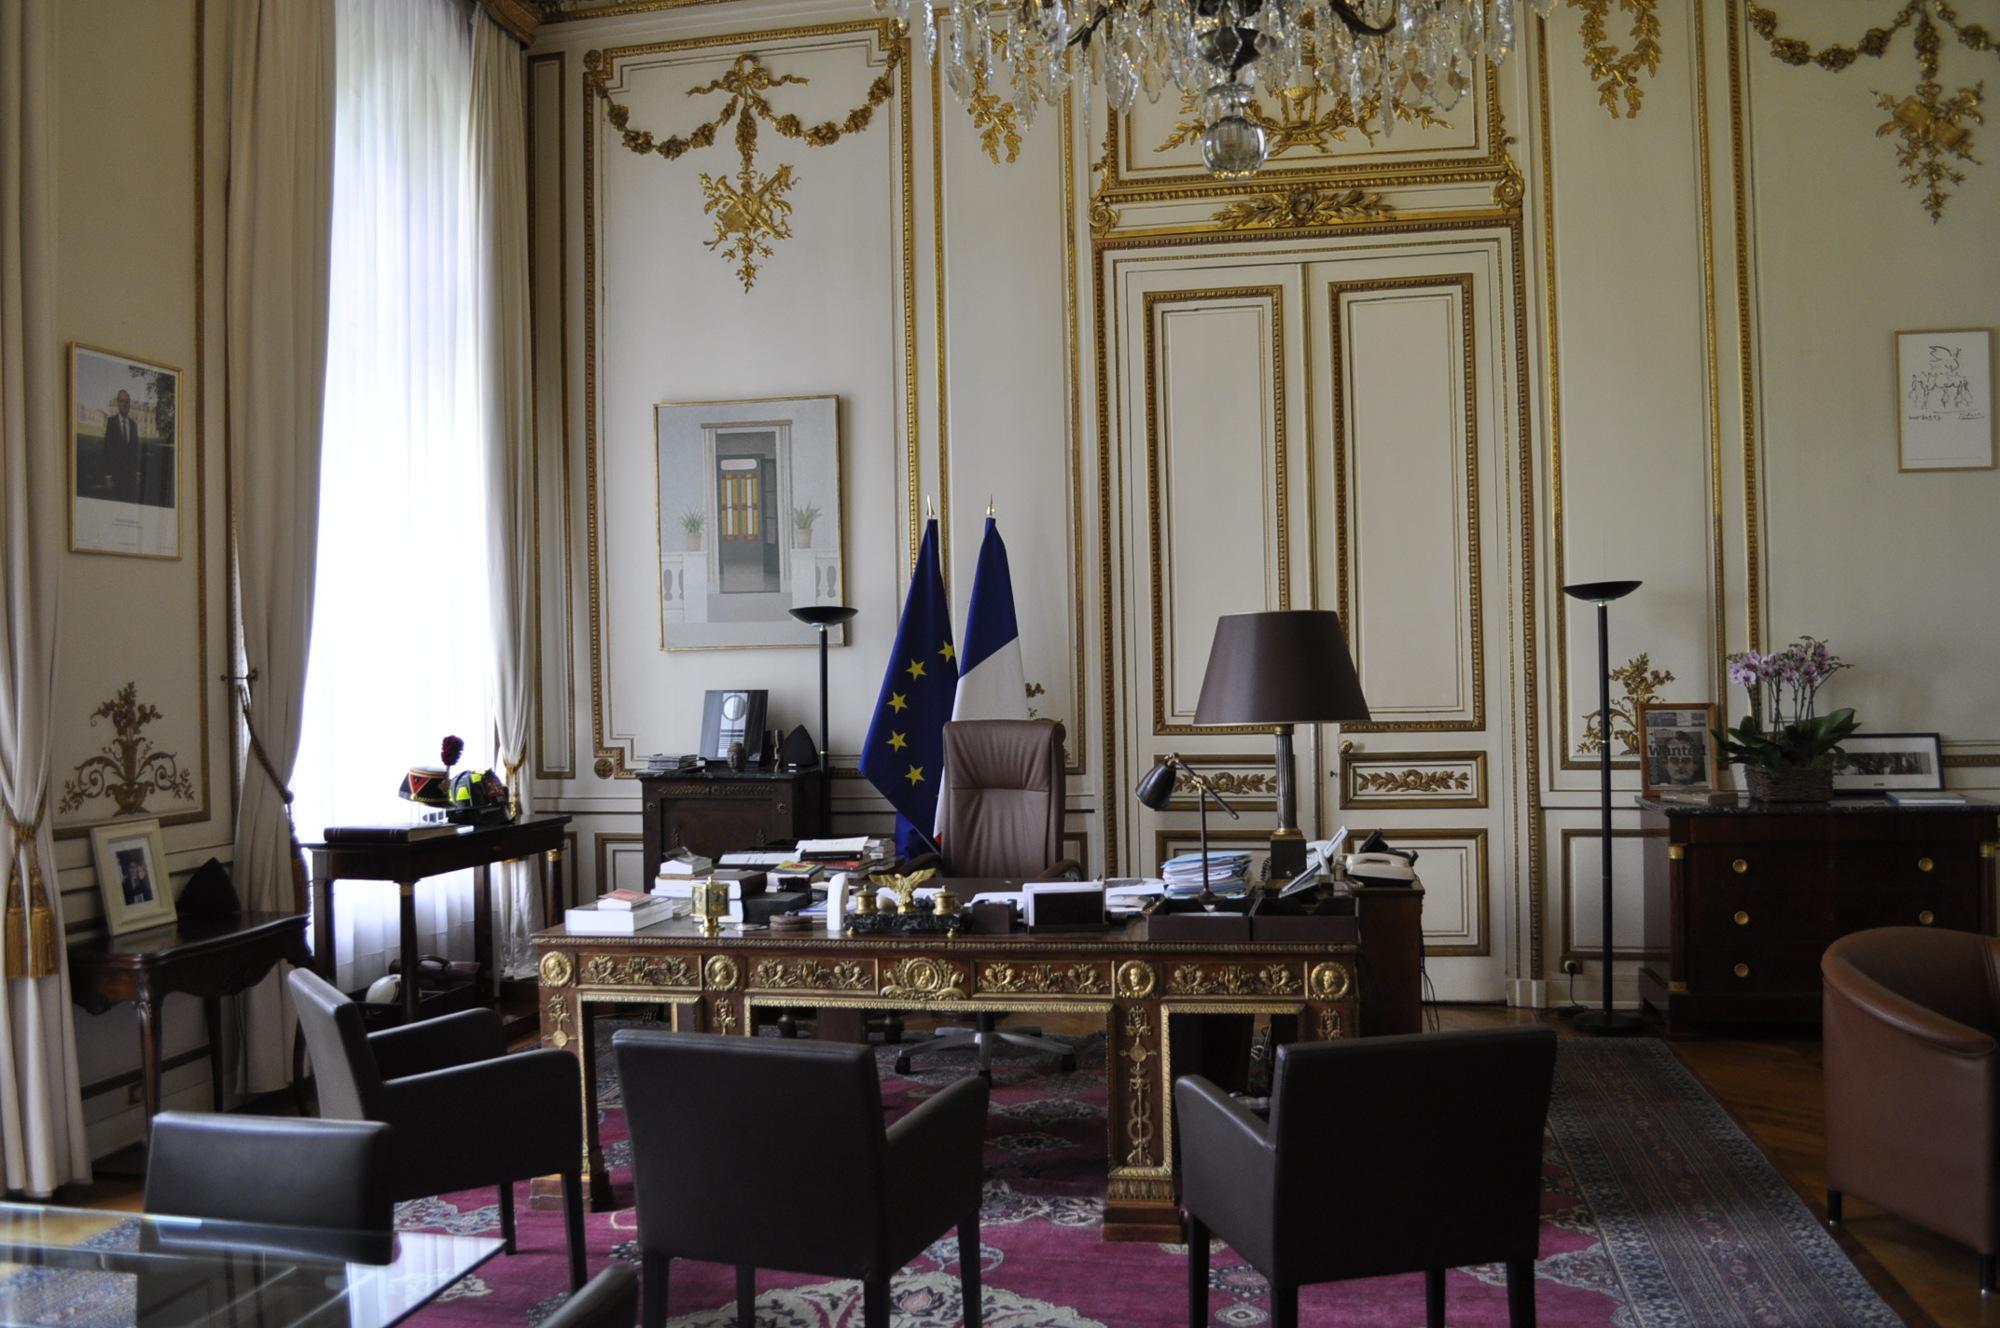 FileHtel De Beauvau Bureau Du MinistreJPG Wikimedia